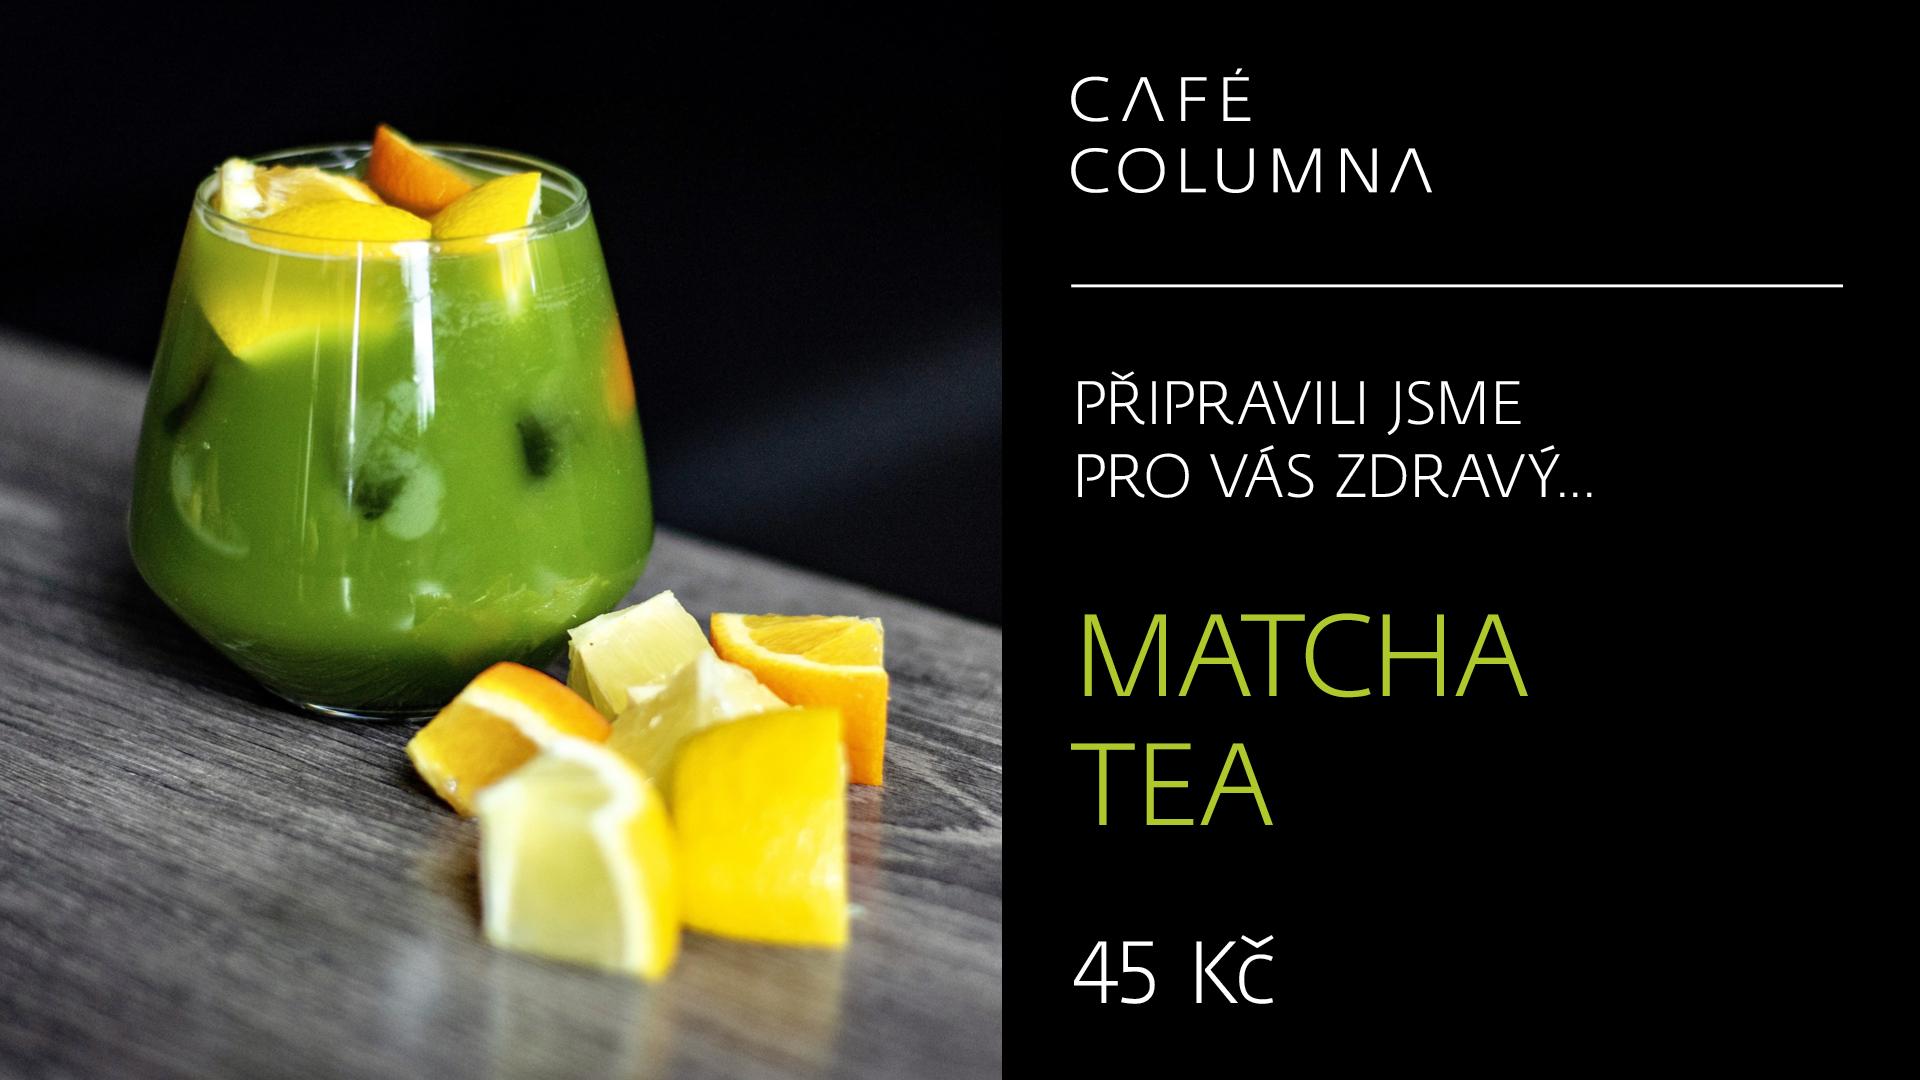 Café_Columna_LCD_1920x1080px_Matcha_tea_2019